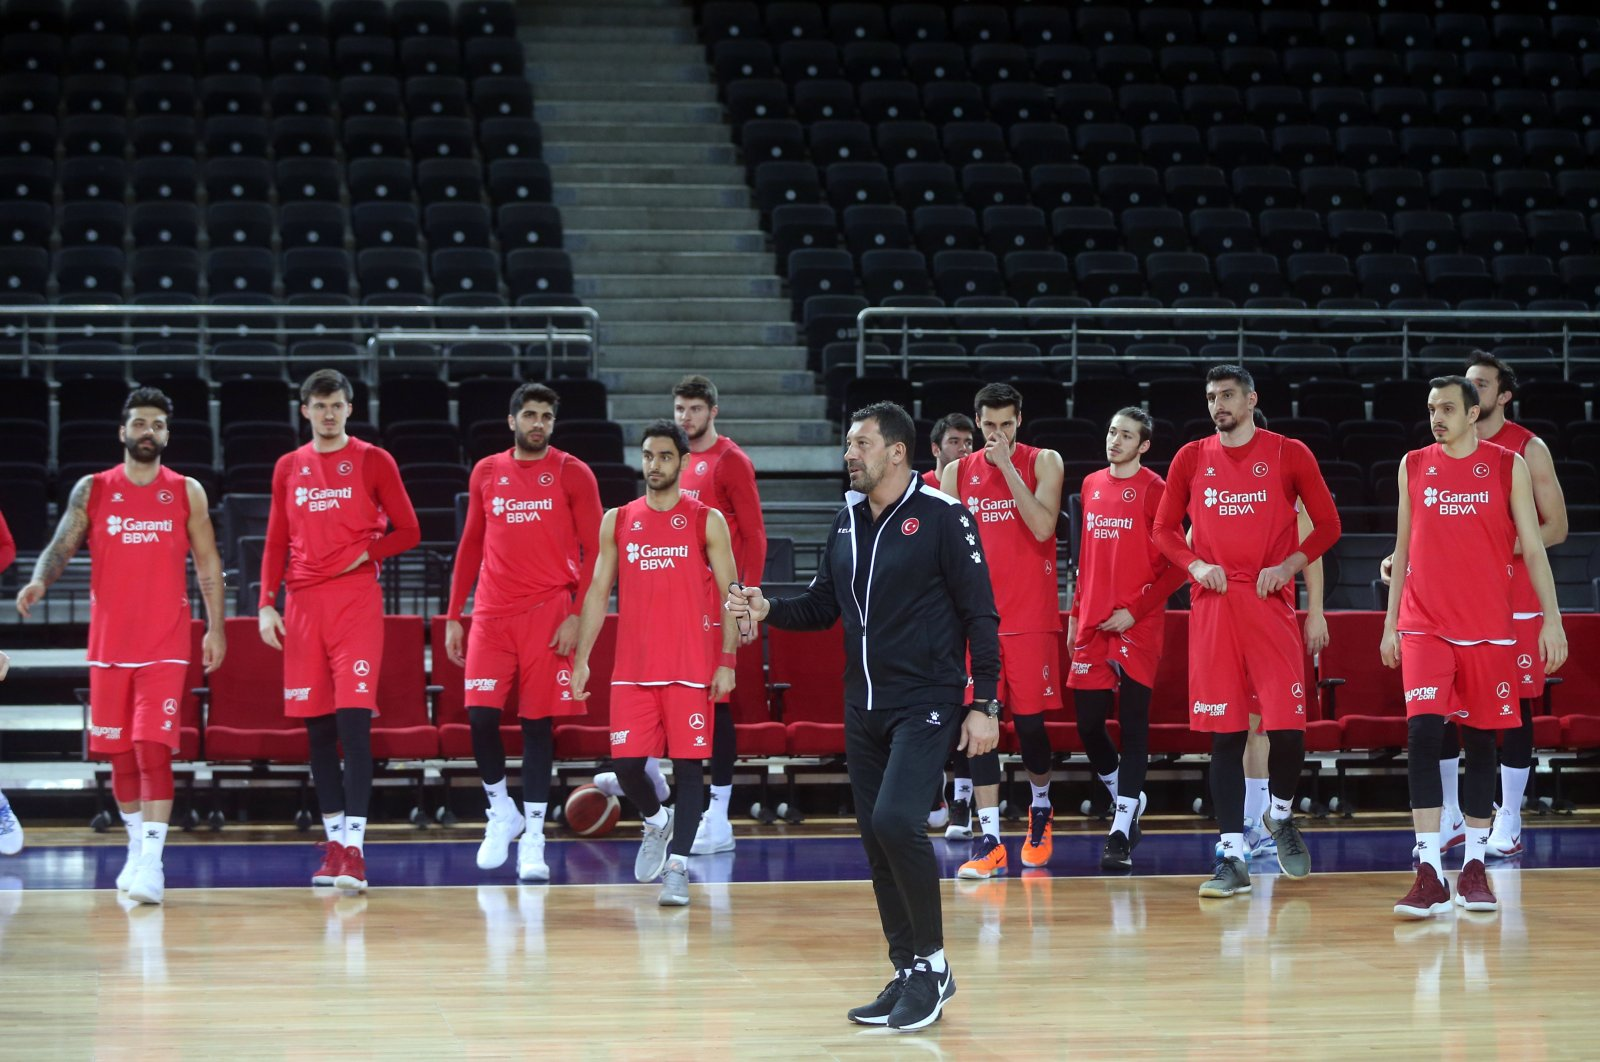 The Turkish men's national basketball team train alongside coach Ufuk Sarıca (C) ahead of the FIBA 2021 qualifiers in Ankara, Turkey, Feb. 18, 2021.(AA File Photo)